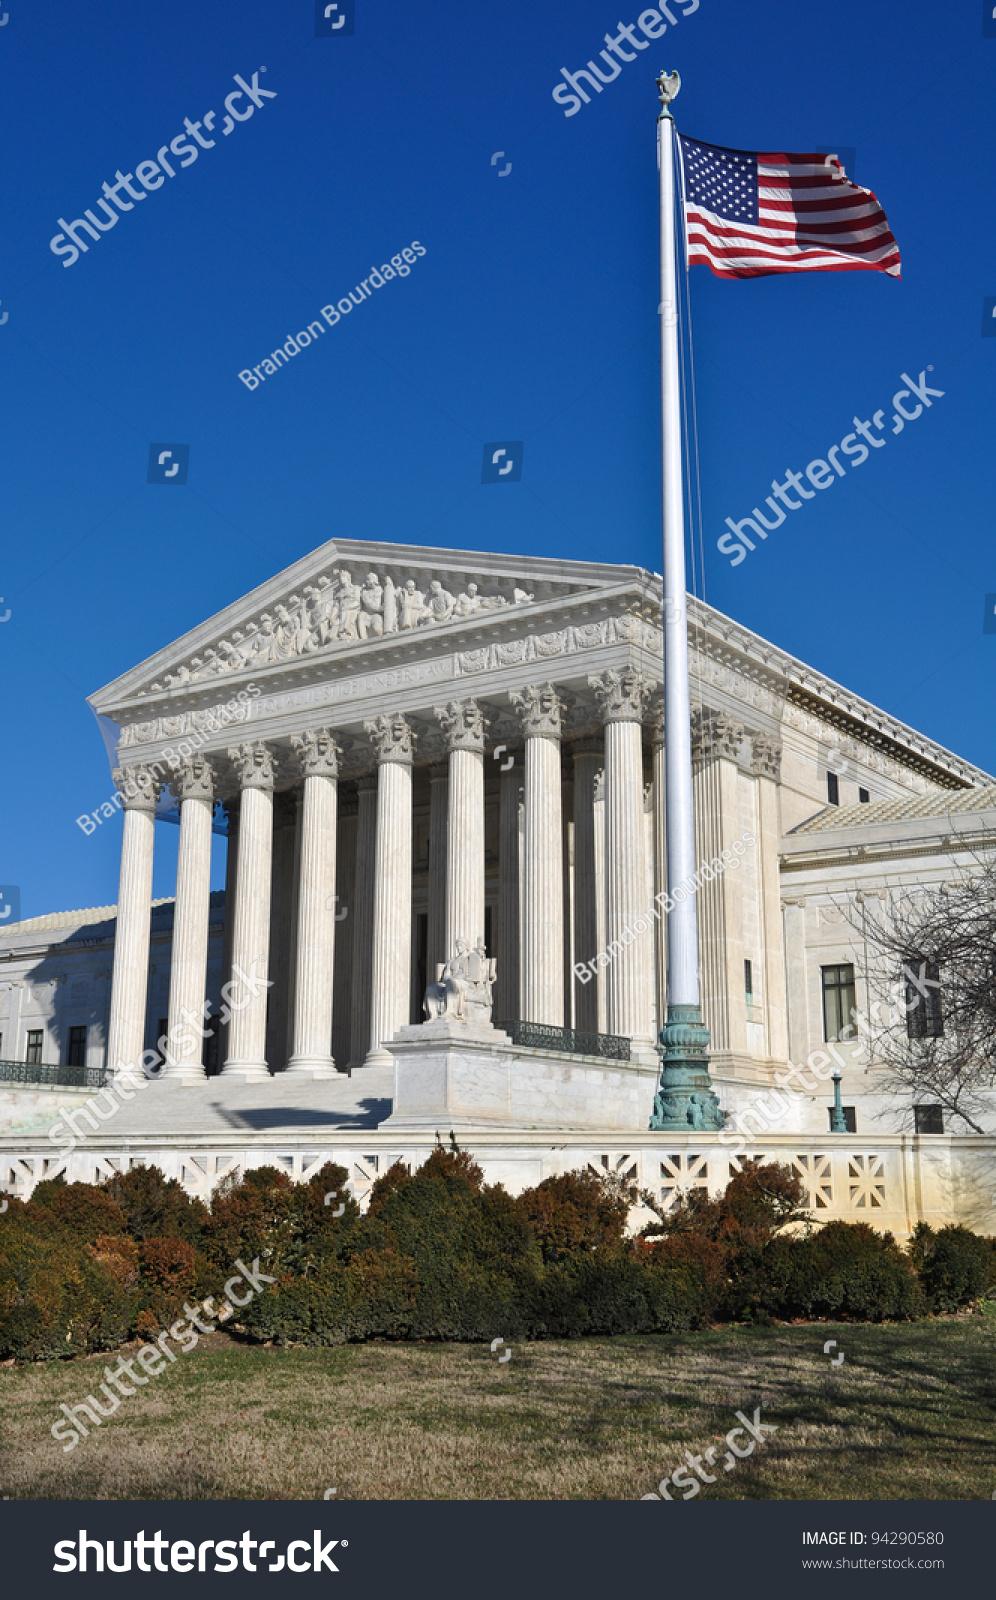 Supreme Court United States Stock Photo 94290580 ...